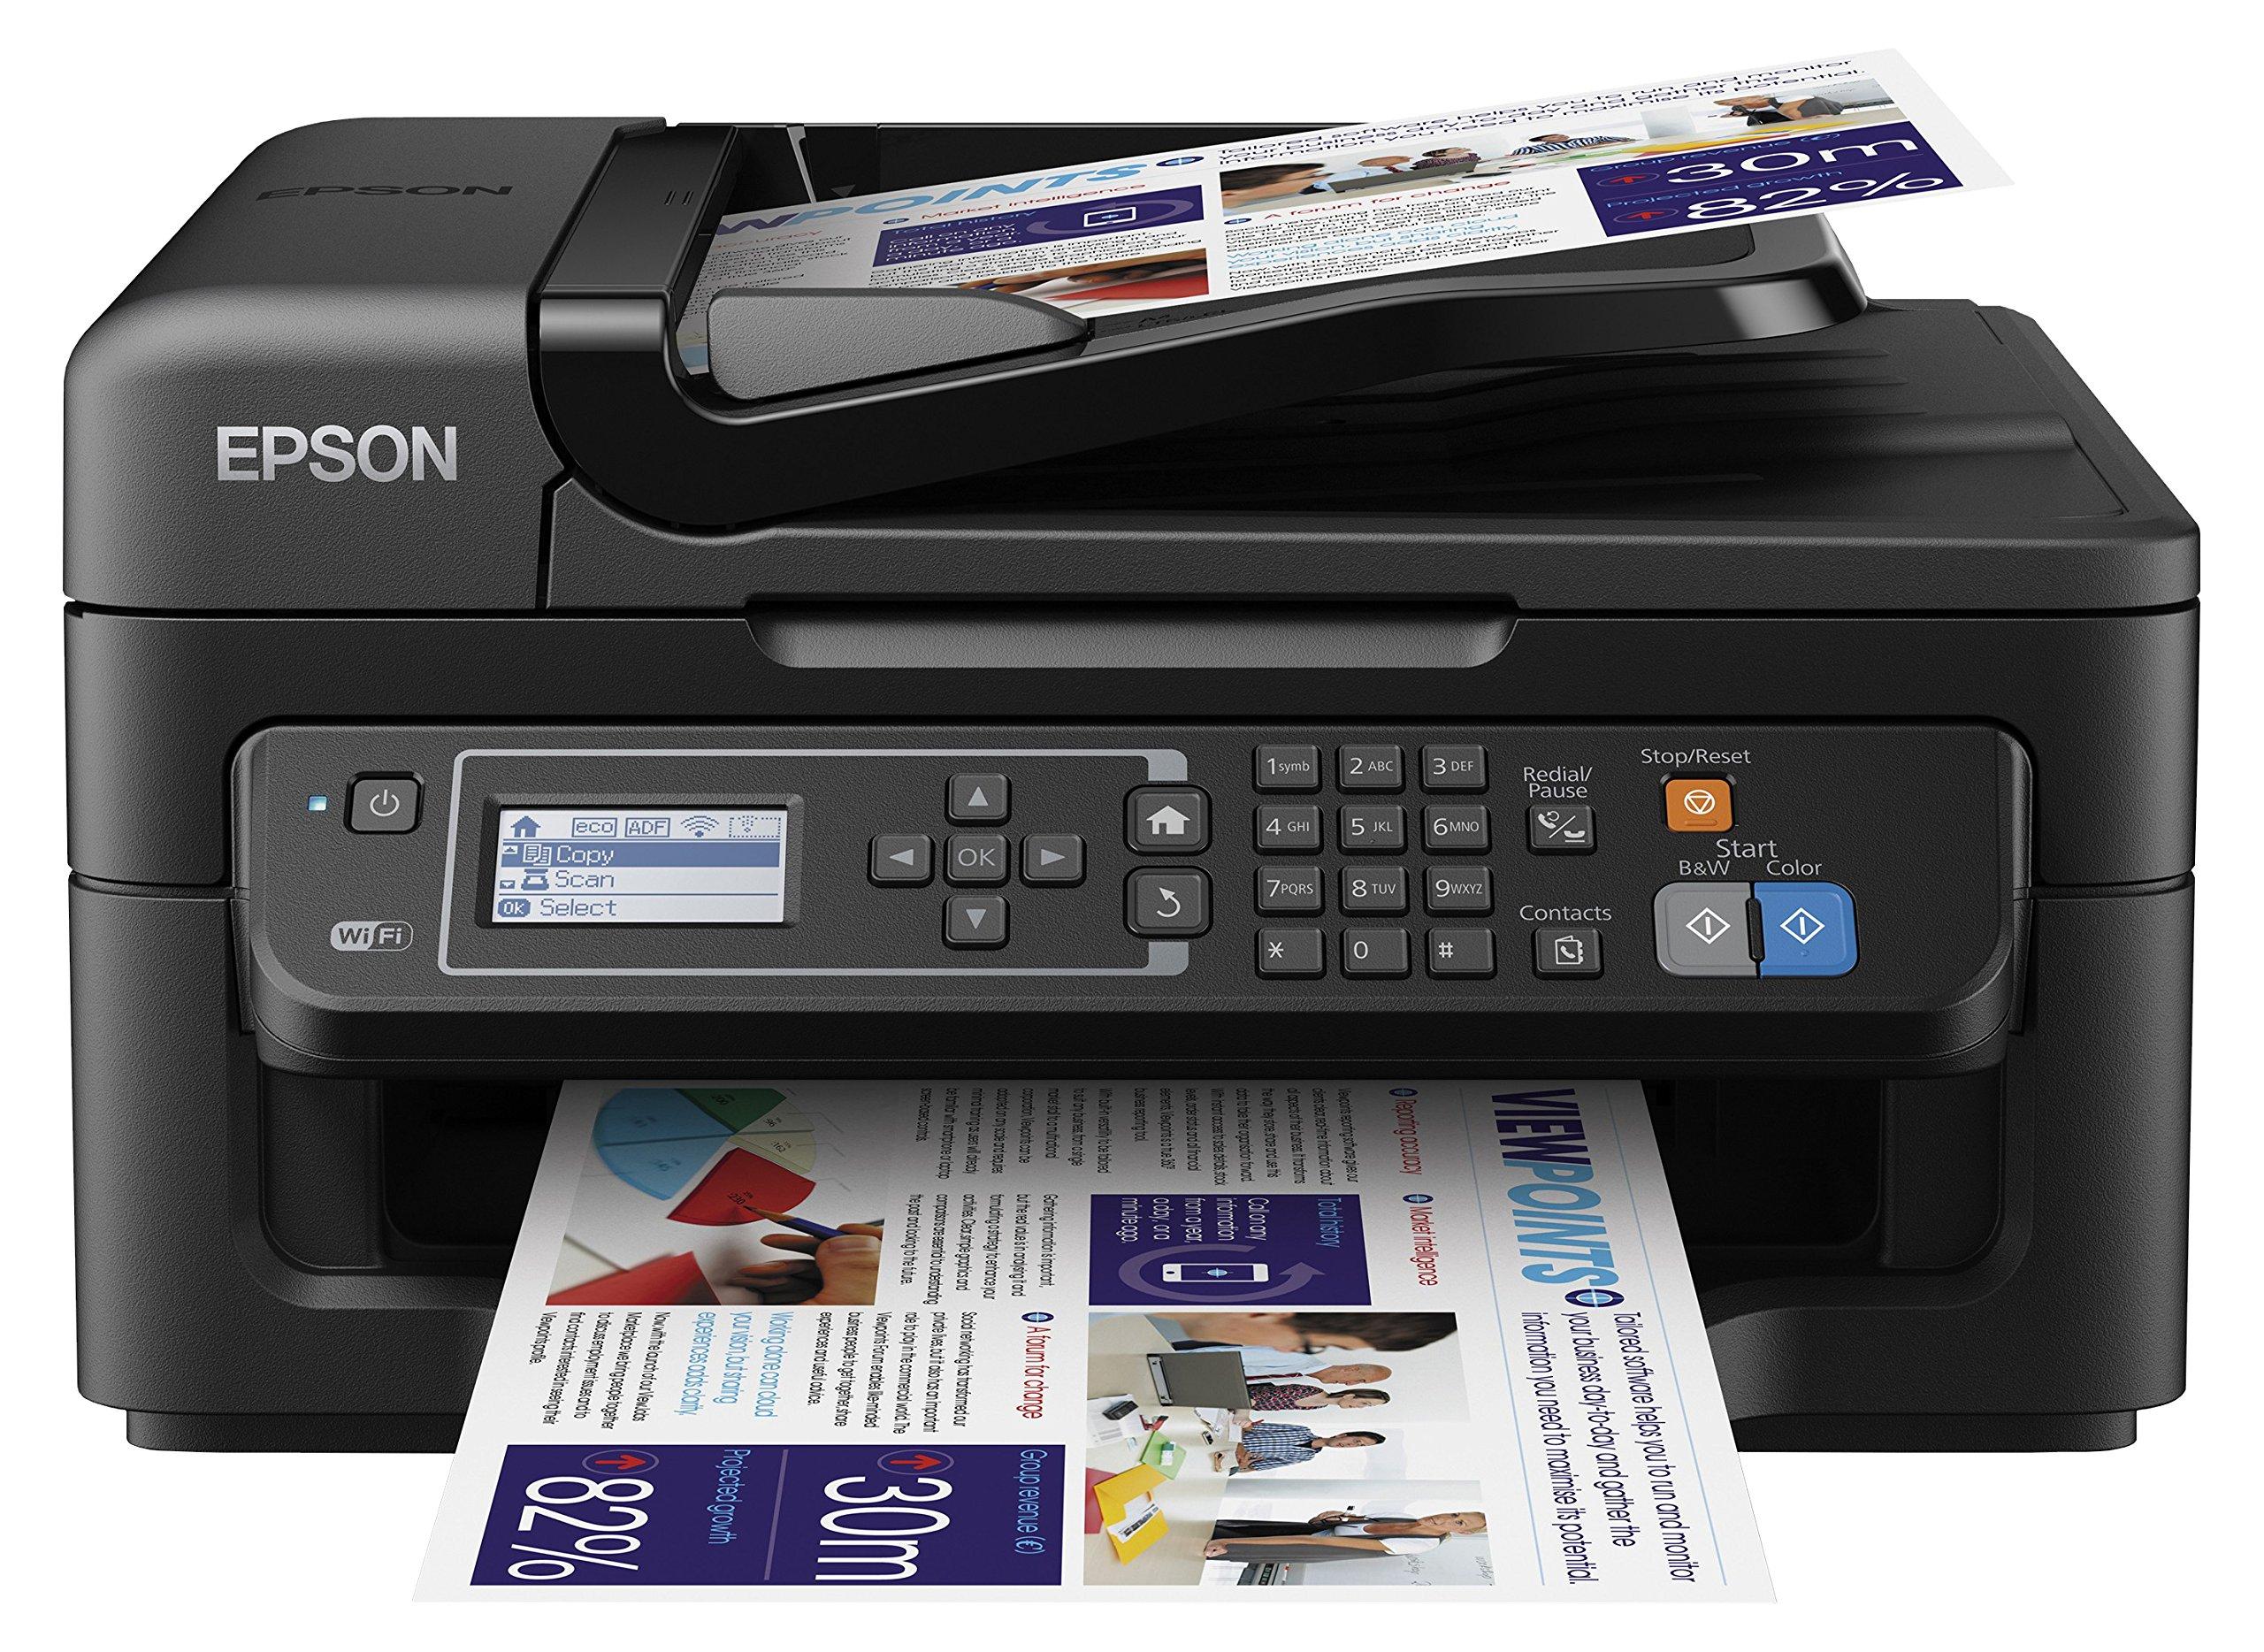 Epson Workforce WF-2630WF - Impresora multifunción de tinta (WiFi, pantalla LCD monocroma